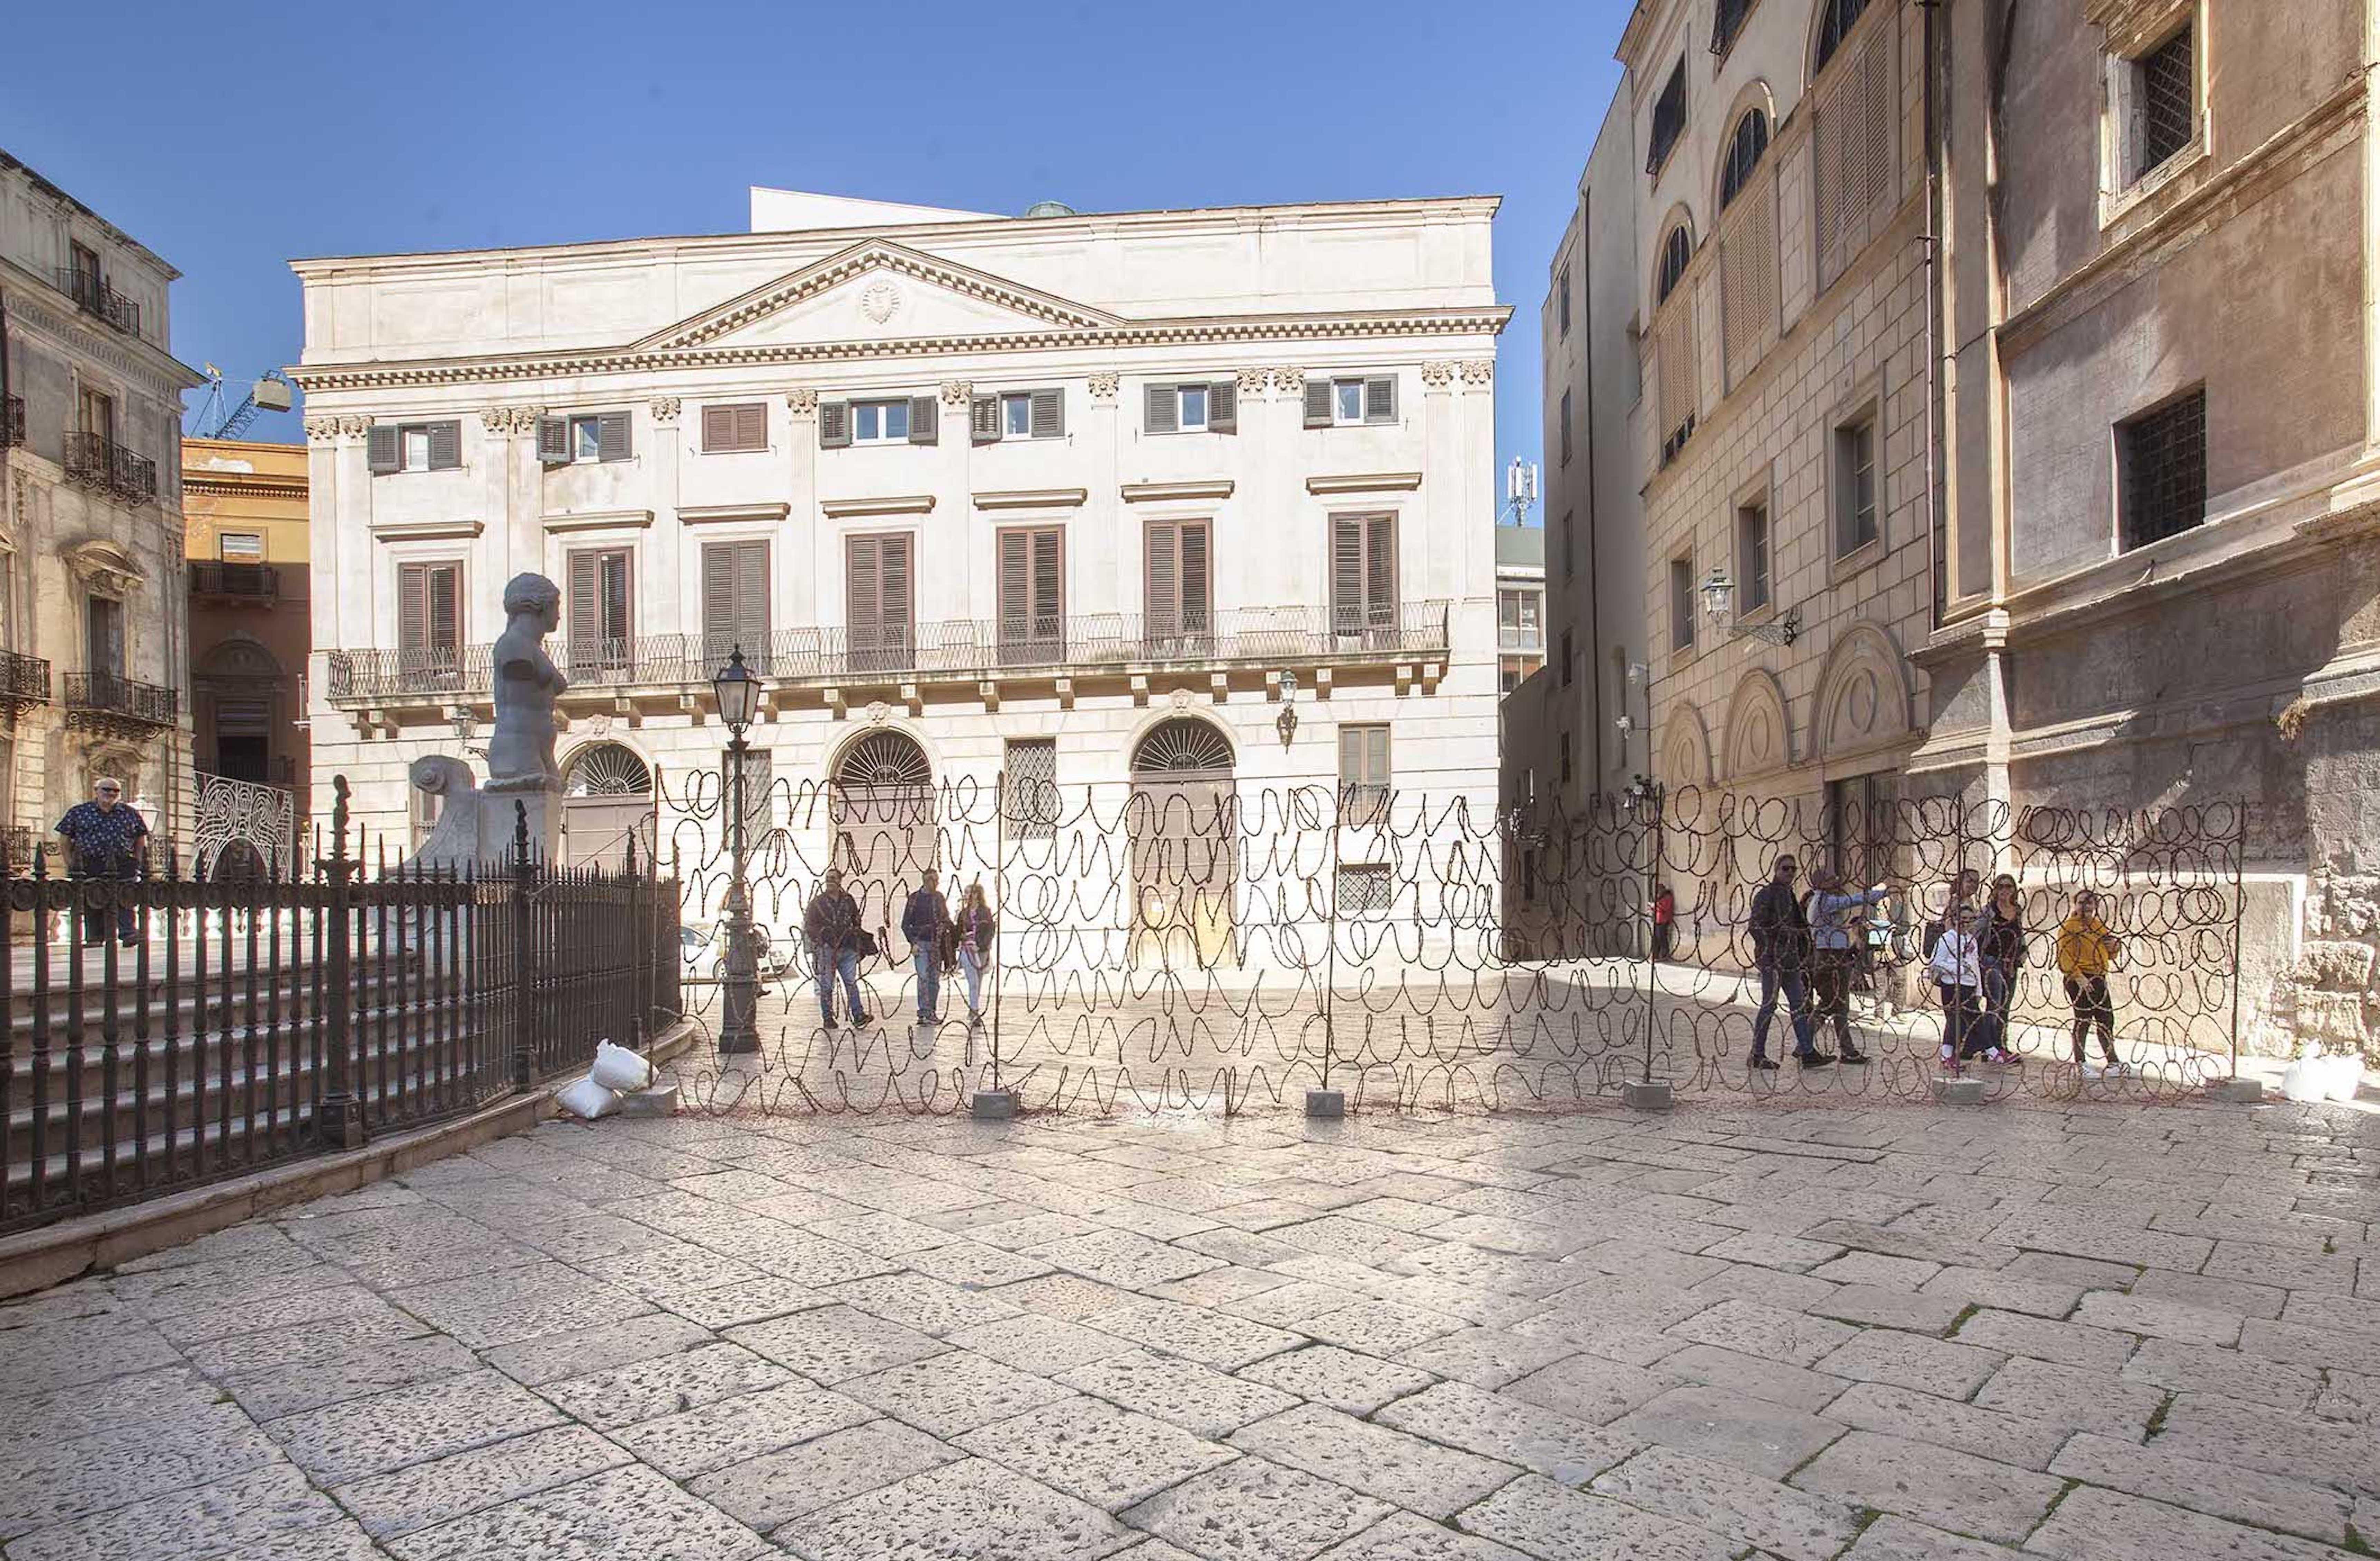 Giuseppina Giordano, THE WALL OF DELICACY, installation's view, Piazza Pretoria, Palermo, Italy / BAM Festival / ph: Stefania Romano